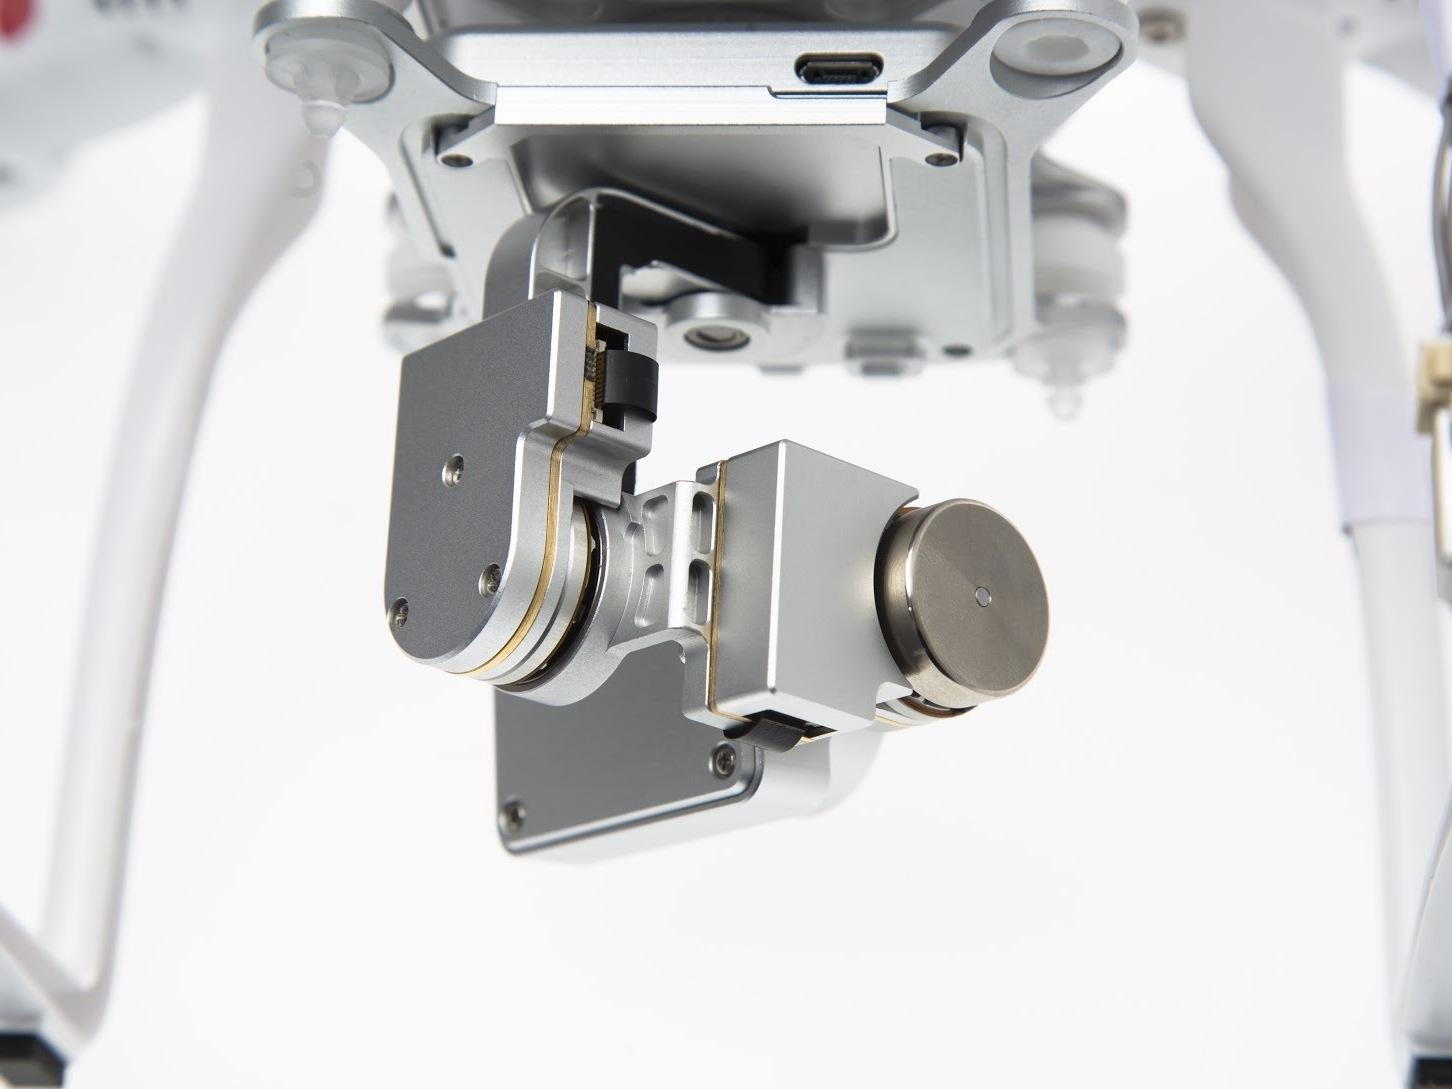 hight resolution of how to level the dji phantom 2 vision camera gimbal